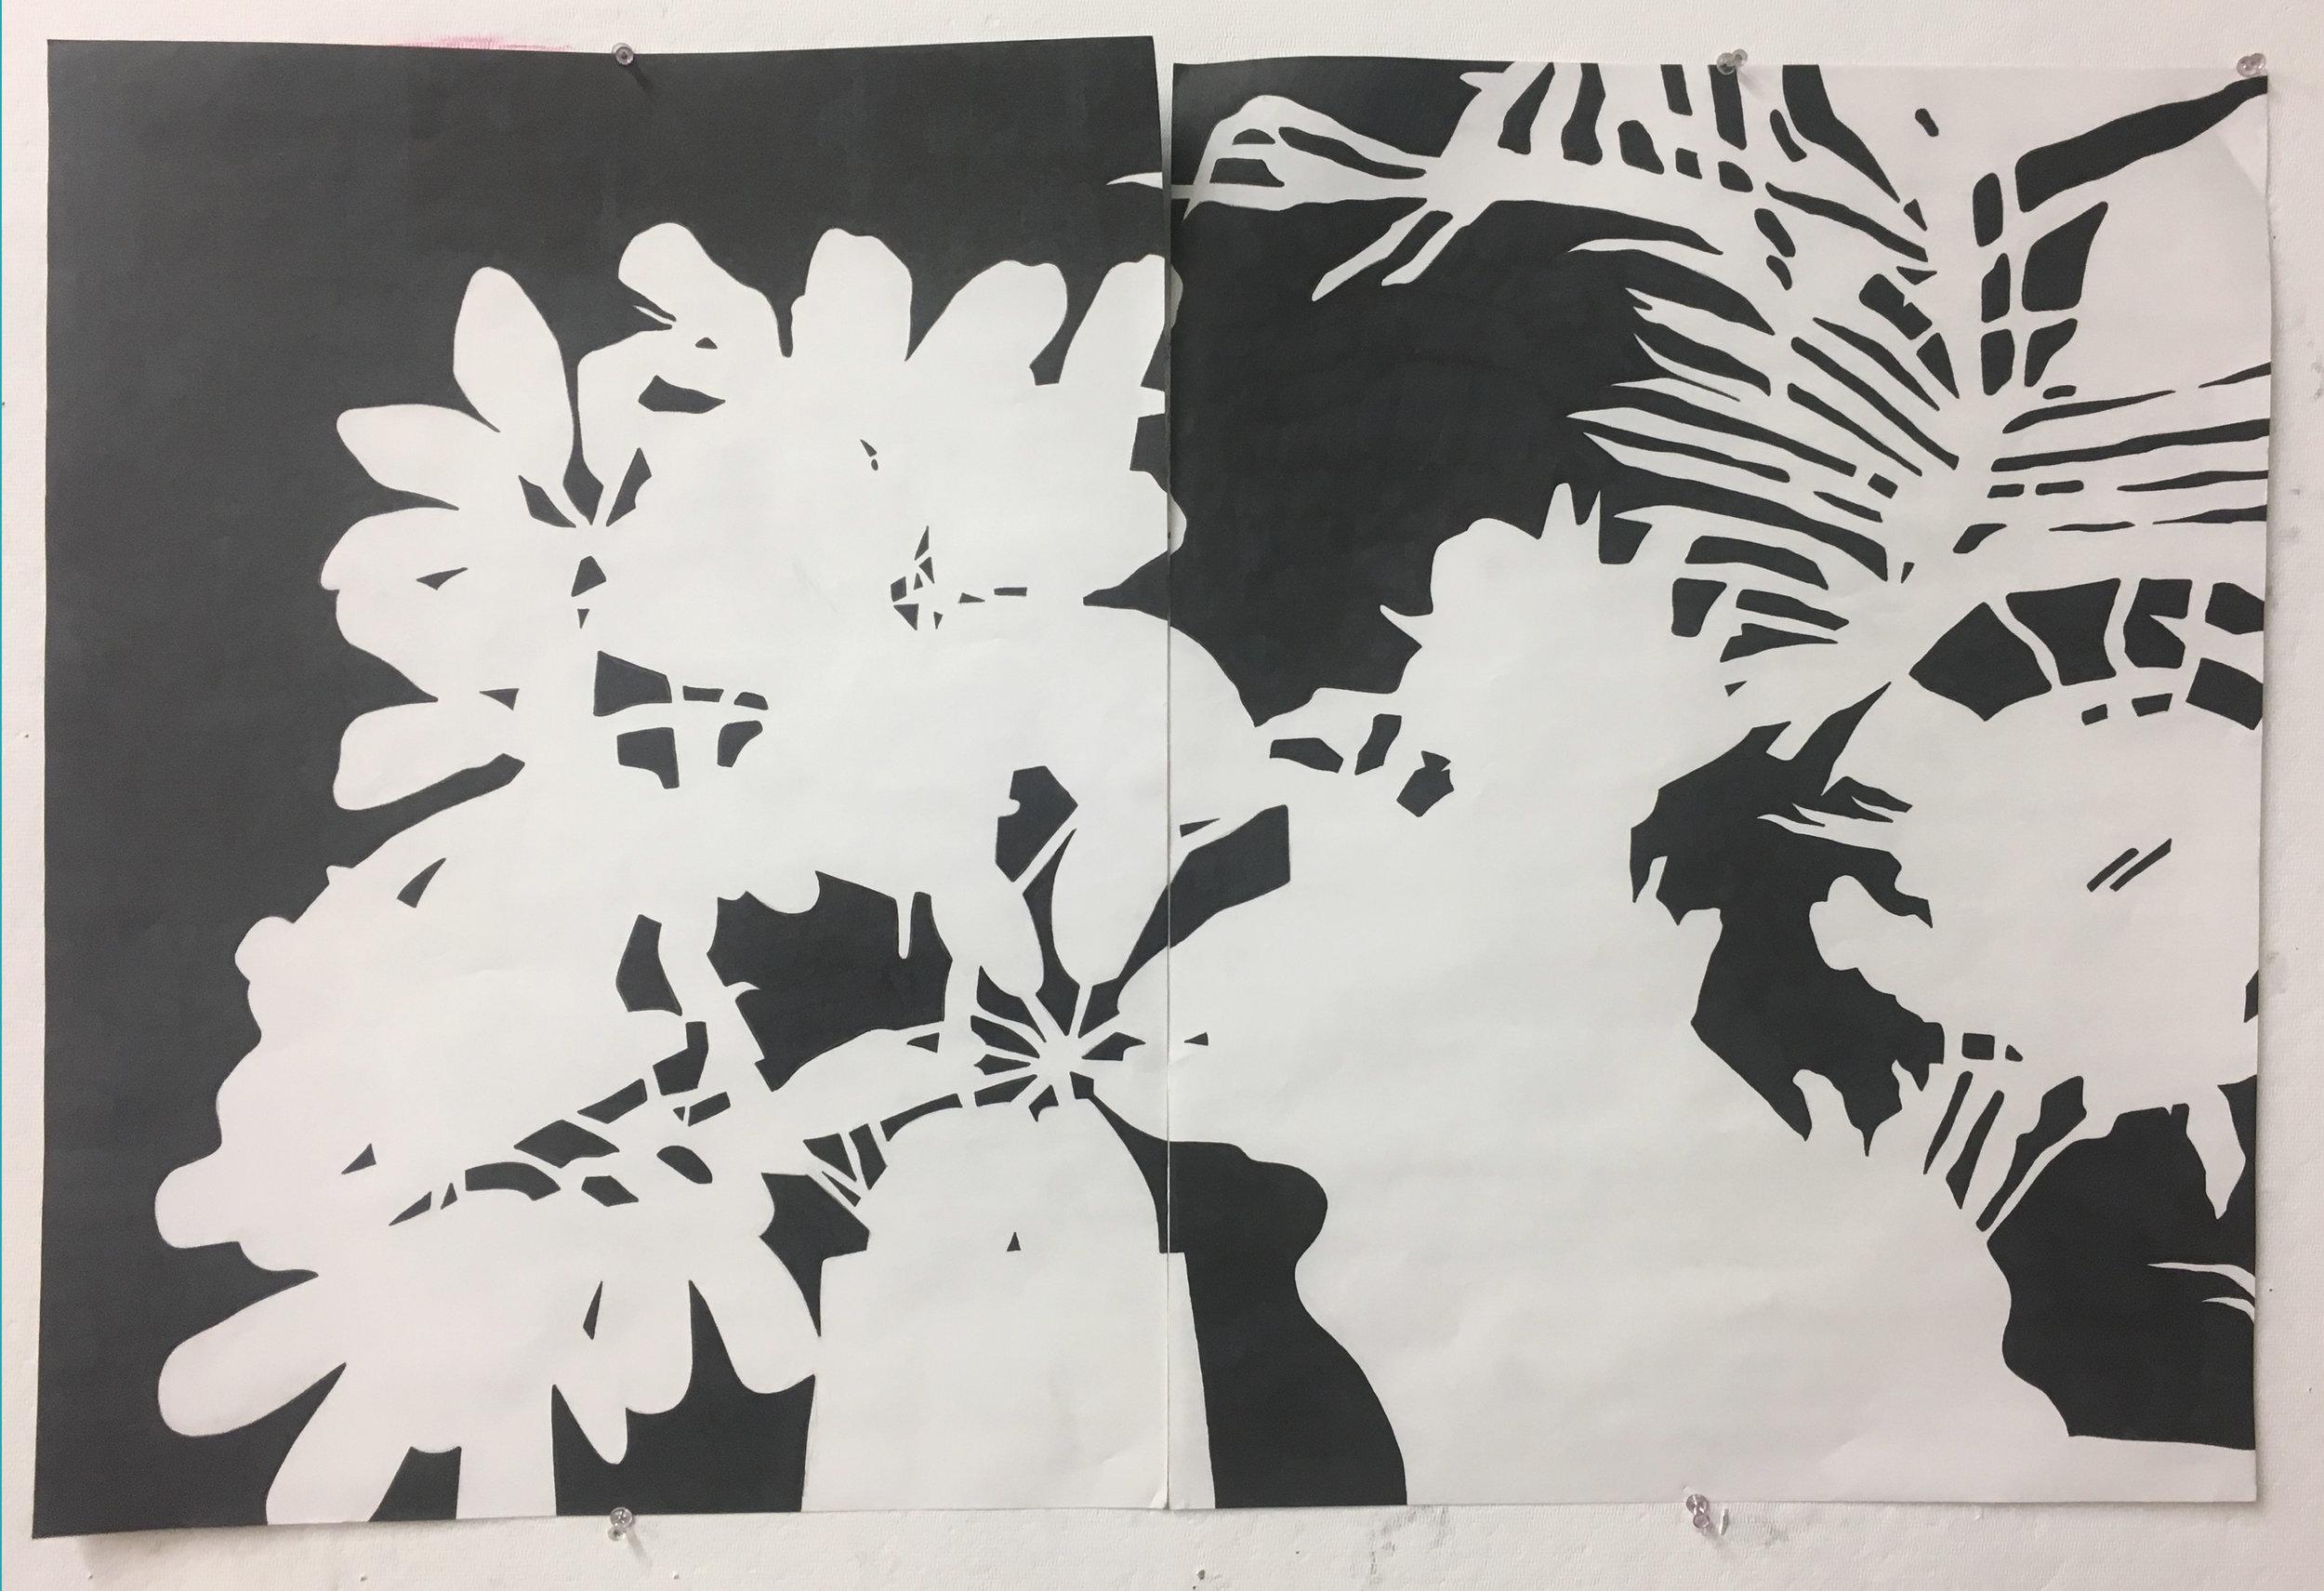 Madison Wallace,  Negative Space, Plants